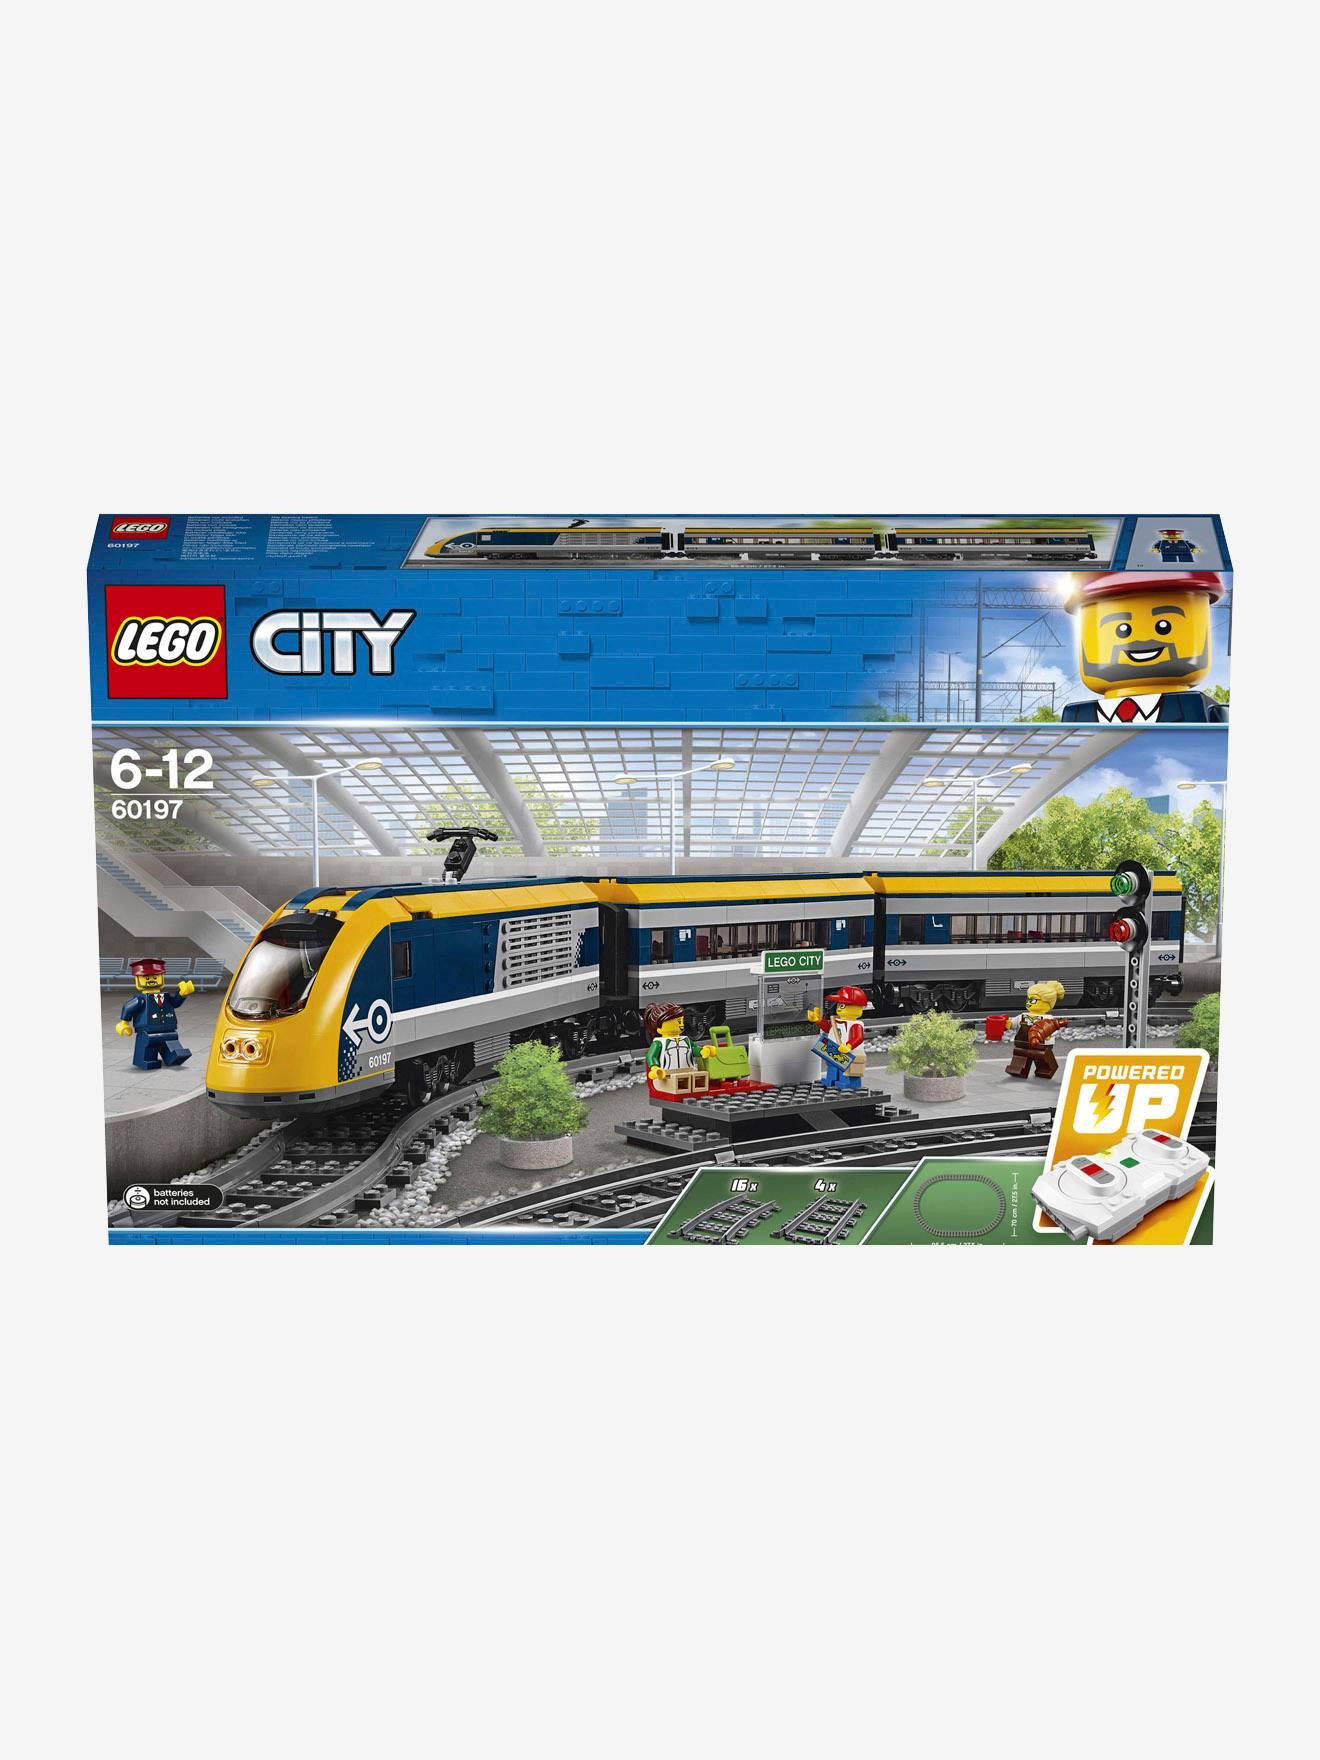 LEGO City 1 Petit Bébé en Blanc